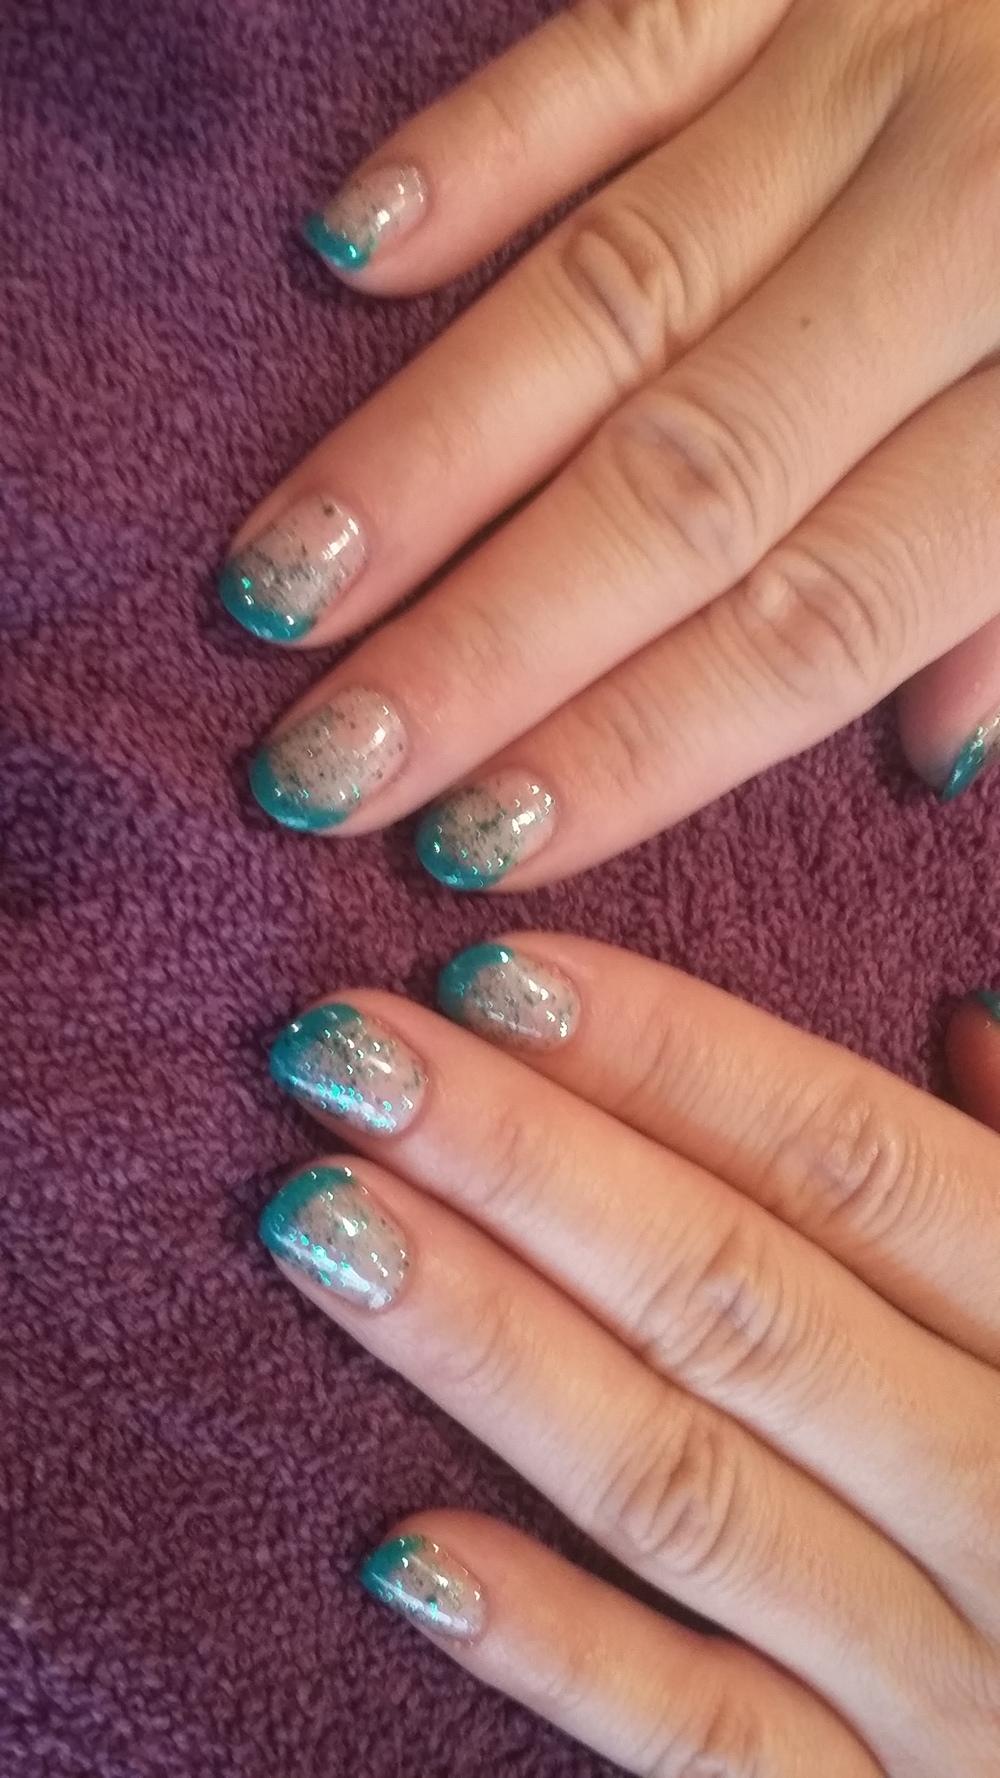 salon-prospect-nails-1.jpg